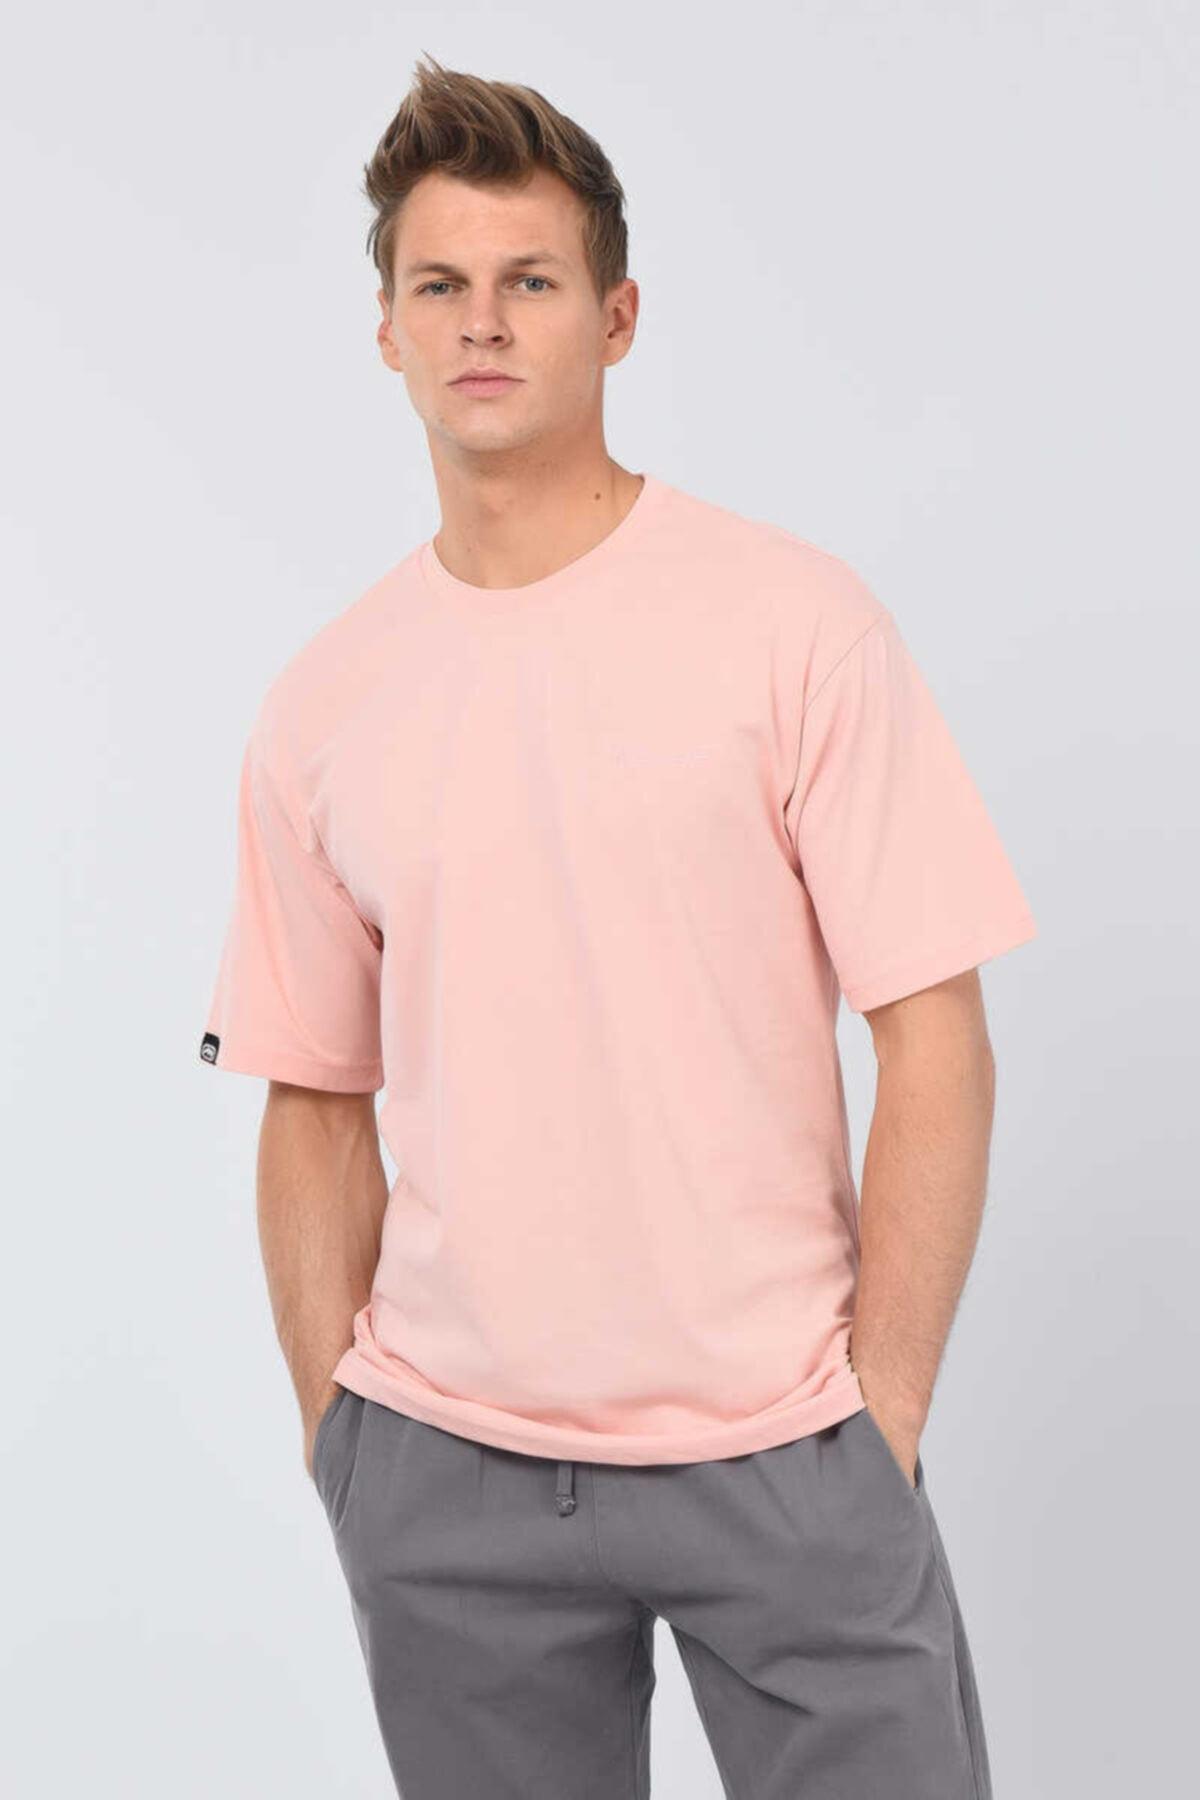 Ferrıs Oversıze Pembe Erkek Bisiklet Yaka Tshirt